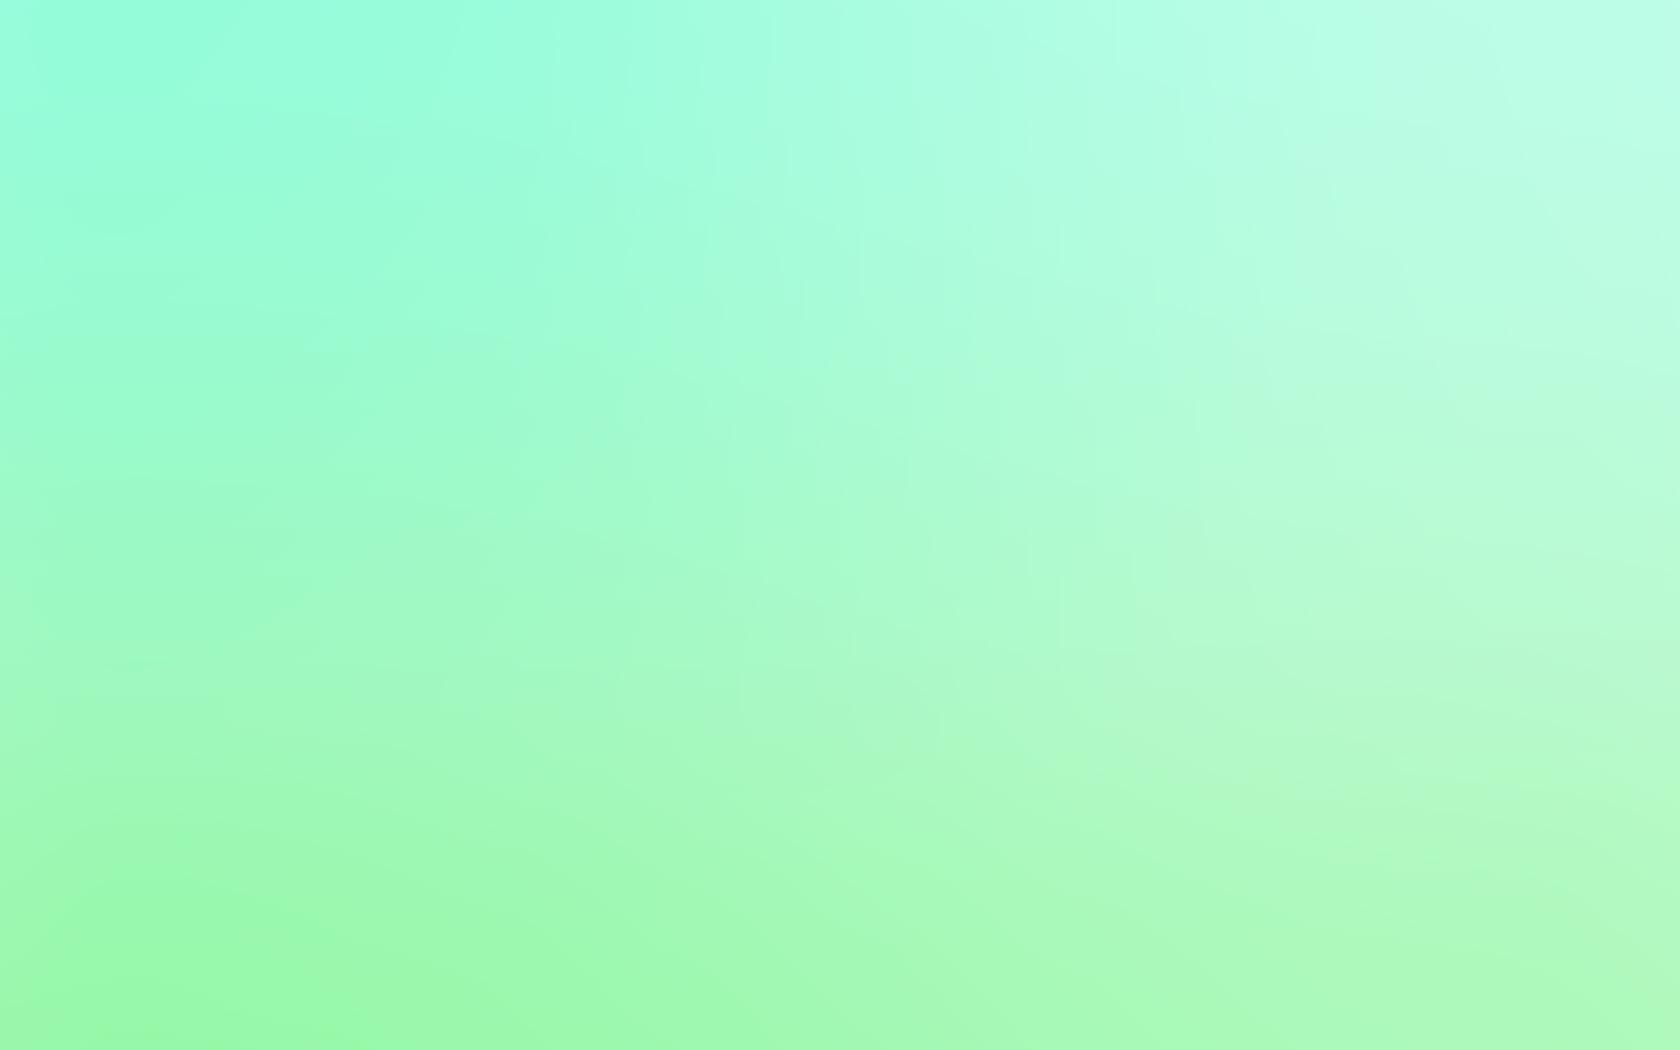 Pastel Cute Wallpaper 1080 Sm59 Cool Pastel Blur Gradation Mint Green Wallpaper